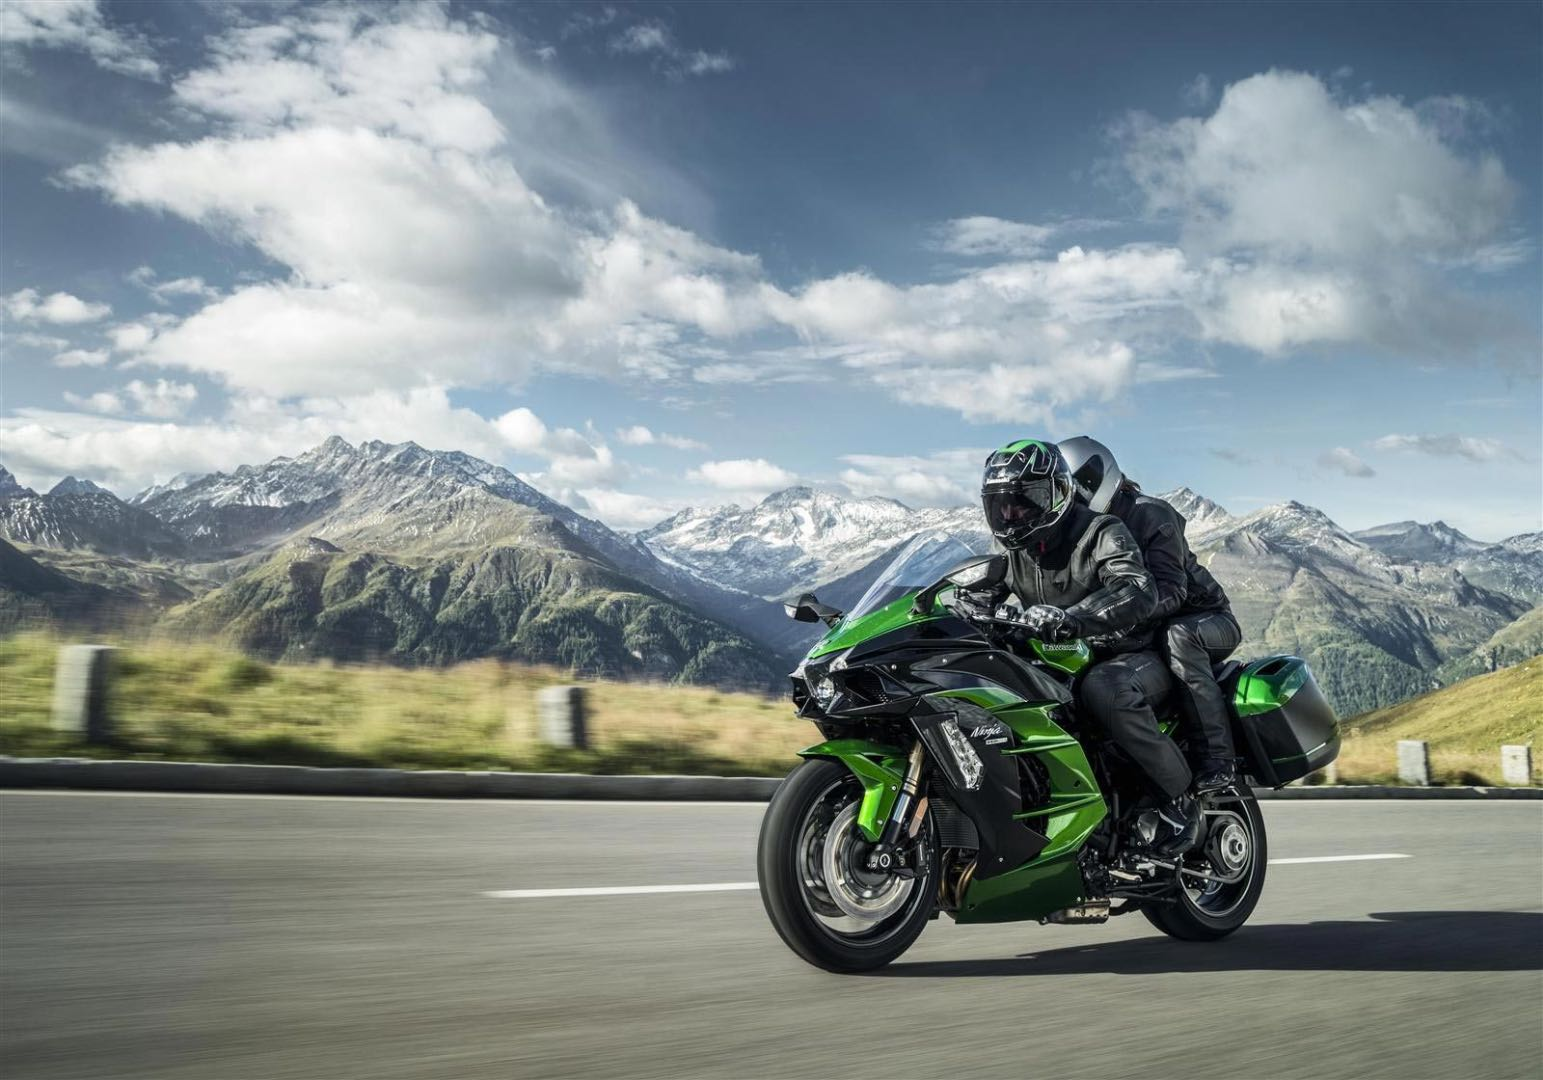 Supercharged Kawasaki Ninja H2 SX Sport Touring Bike